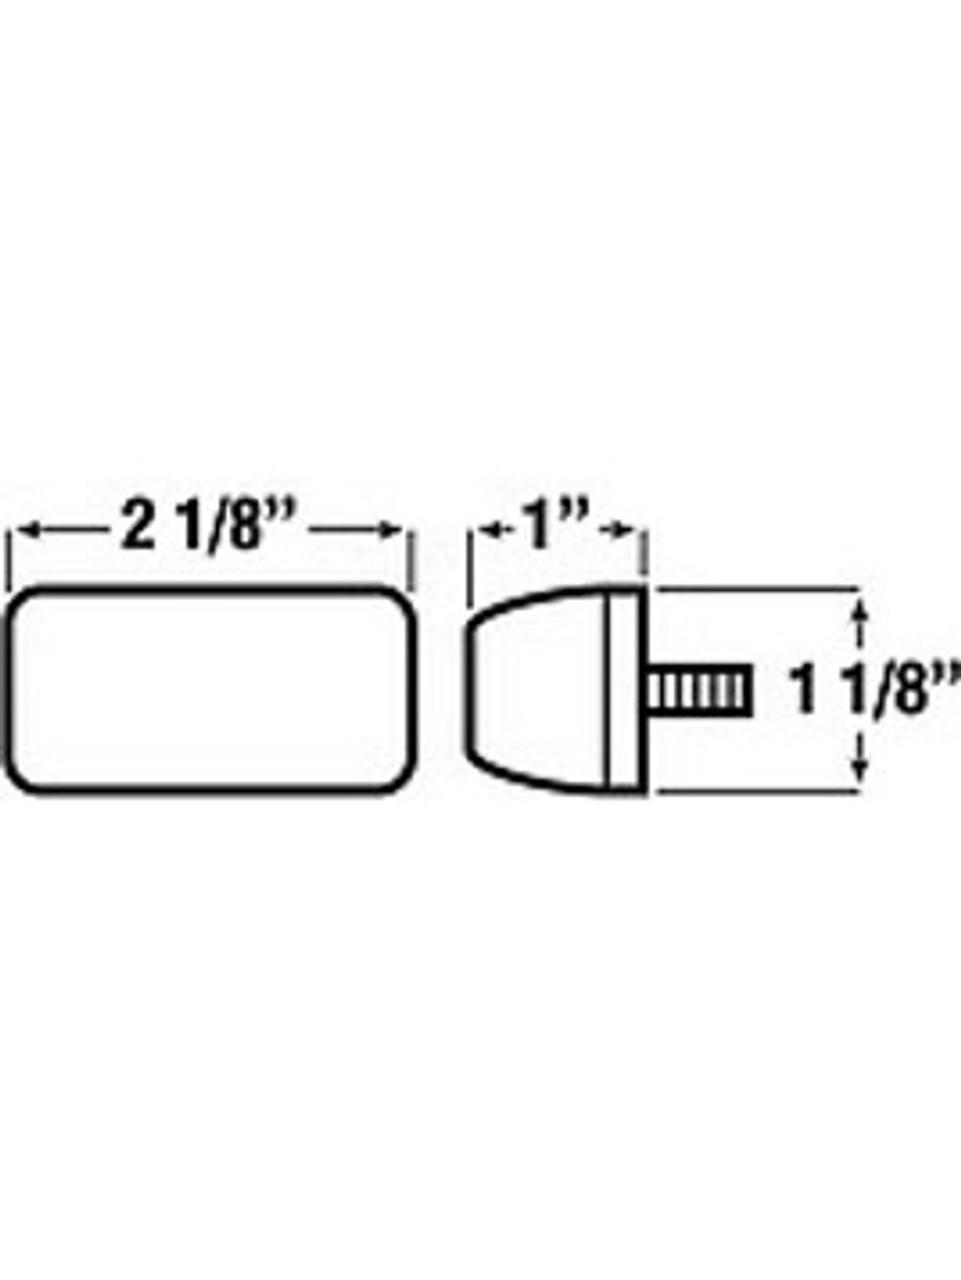 151R --- Mini-Light Clearance/Side Marker Light - Submersible